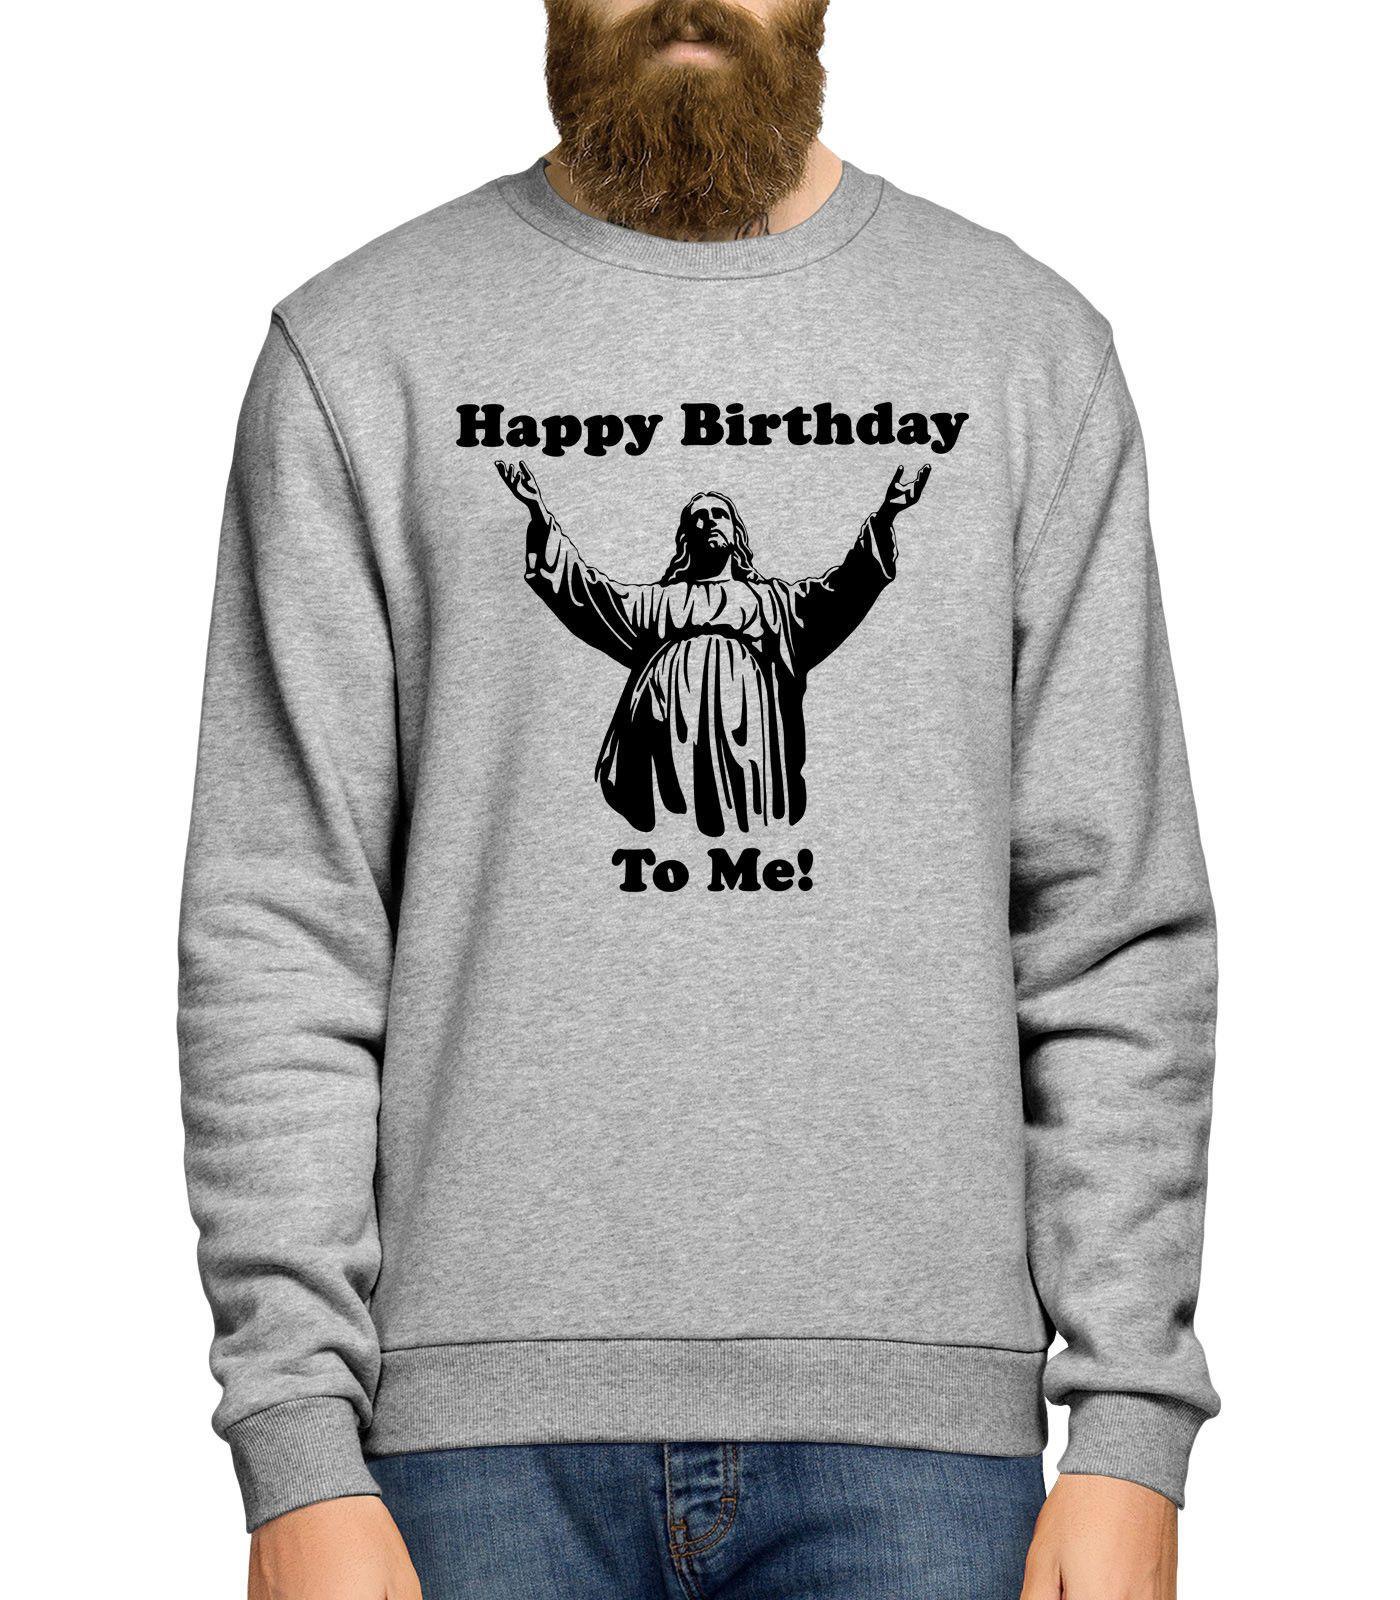 Happy Birthday To Me Christmas Sweater Funny Jesus Xmas Jumper Top ...